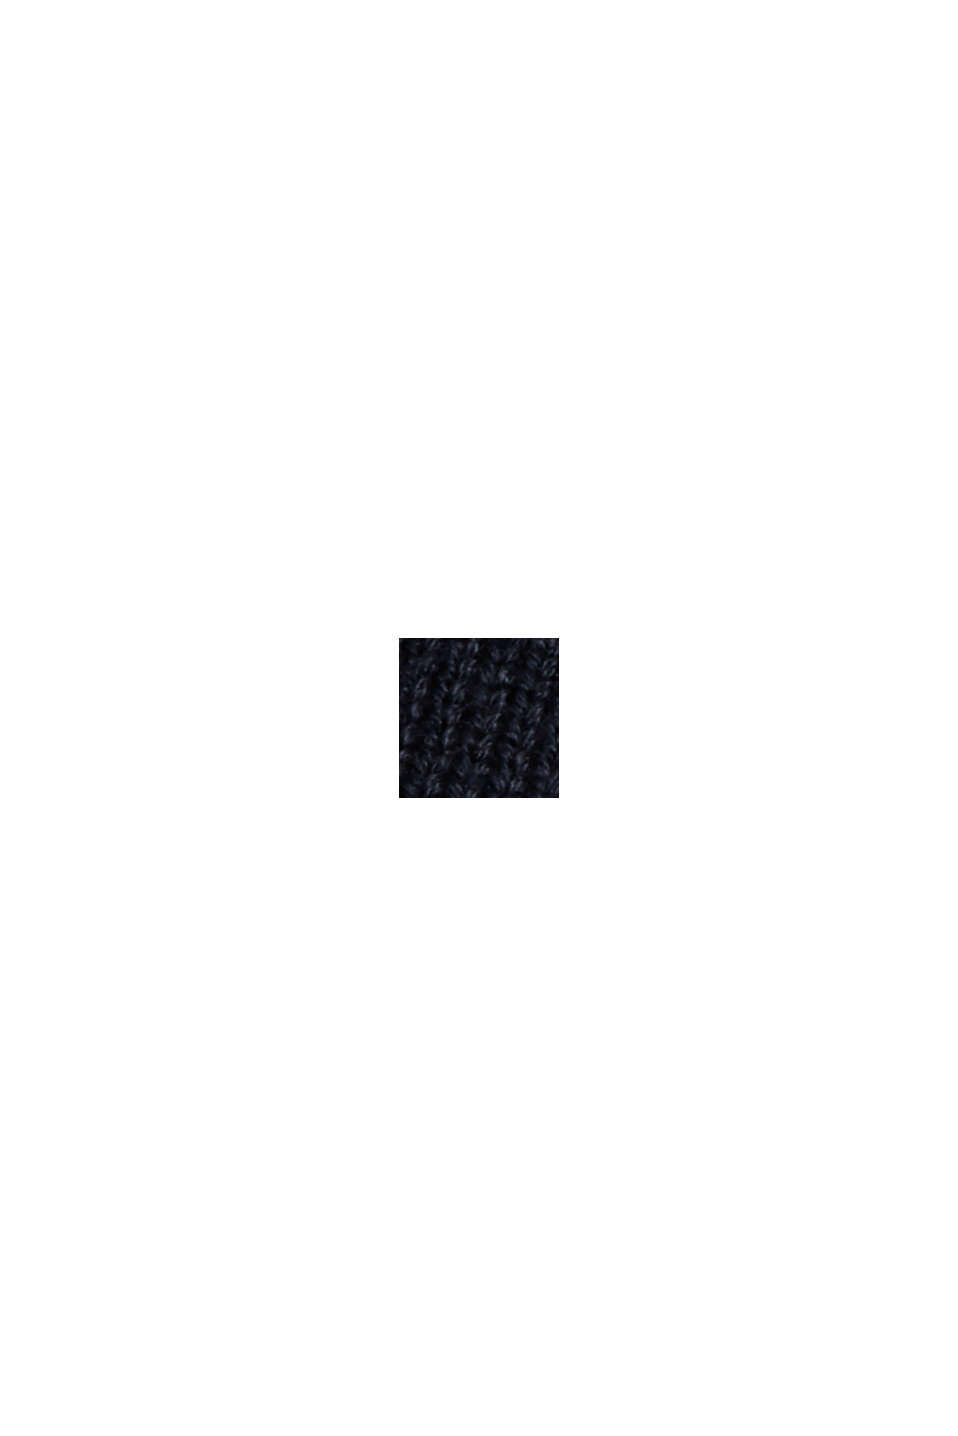 Lynlåscardigan af 100% pimabomuld, NAVY, swatch